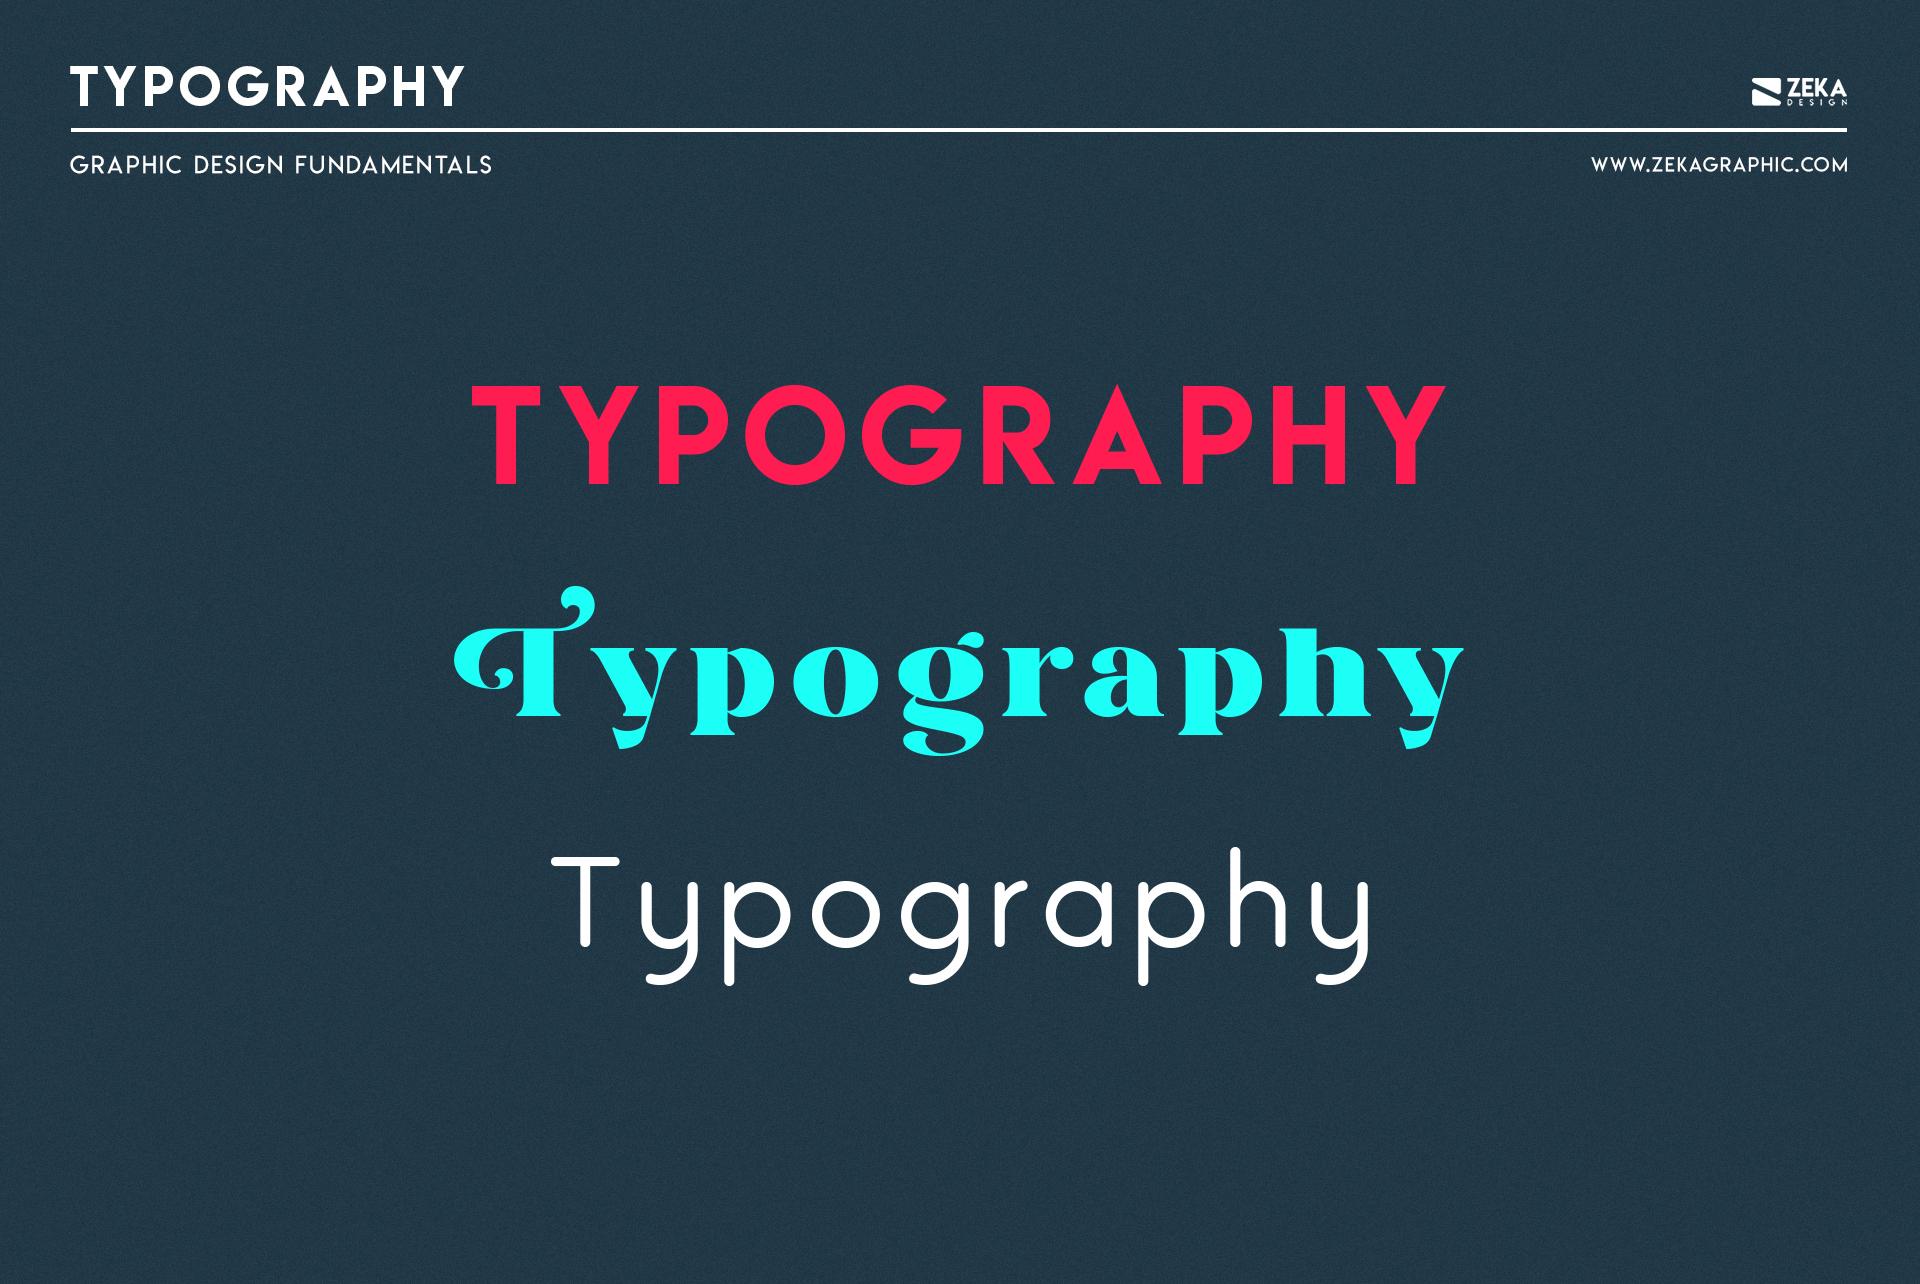 Typography Graphic Design Fundamental Elements